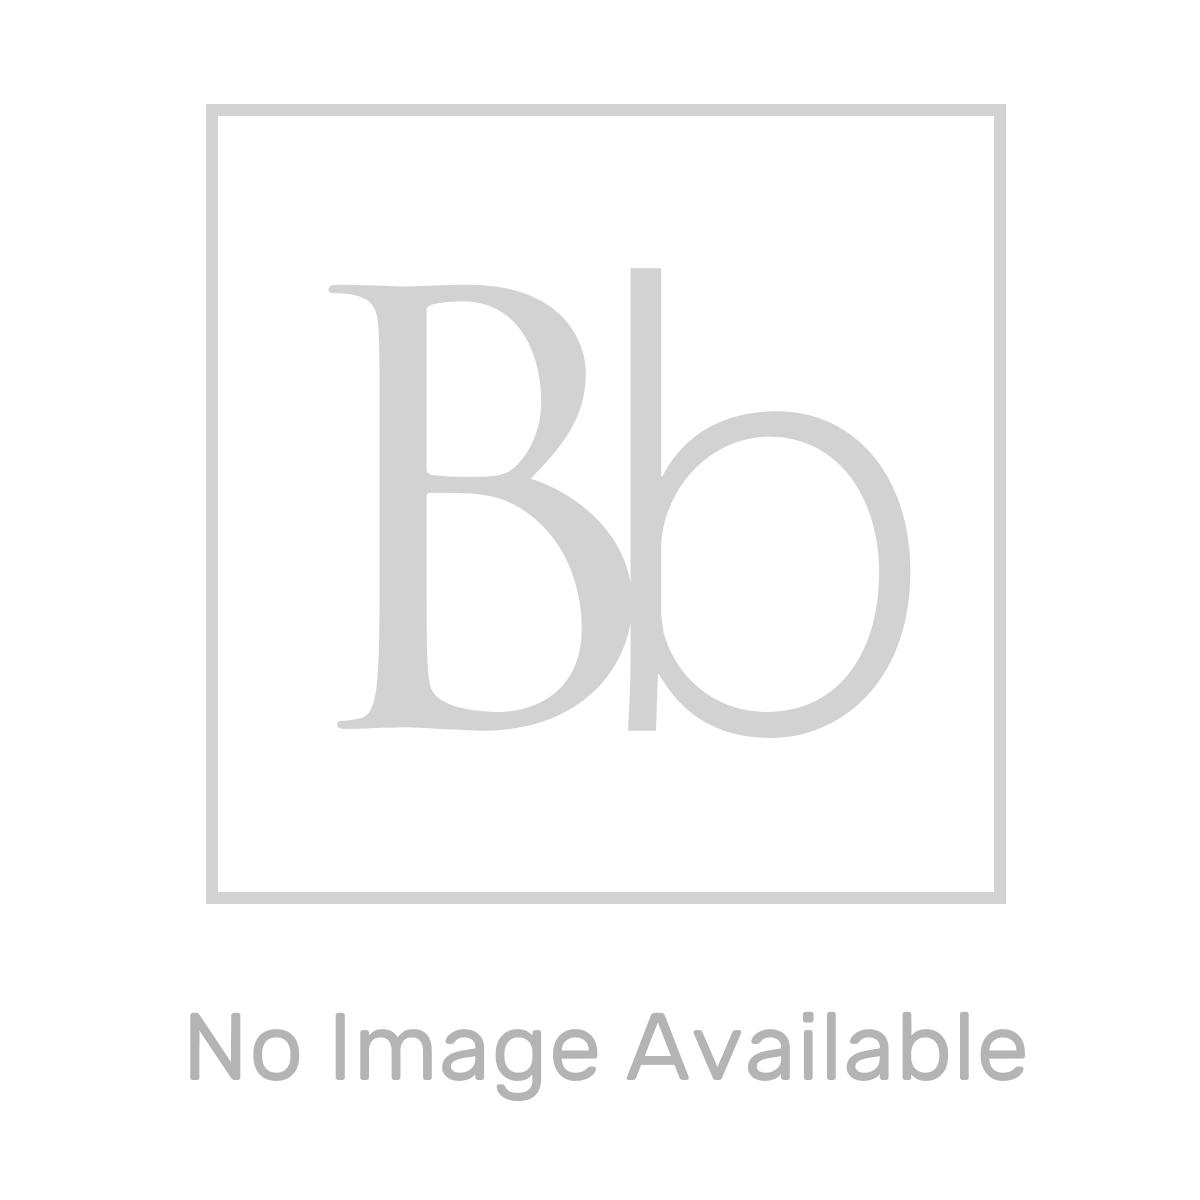 Vitra Neon Space Saving Shower Bath 1700 x 500mm Left Hand